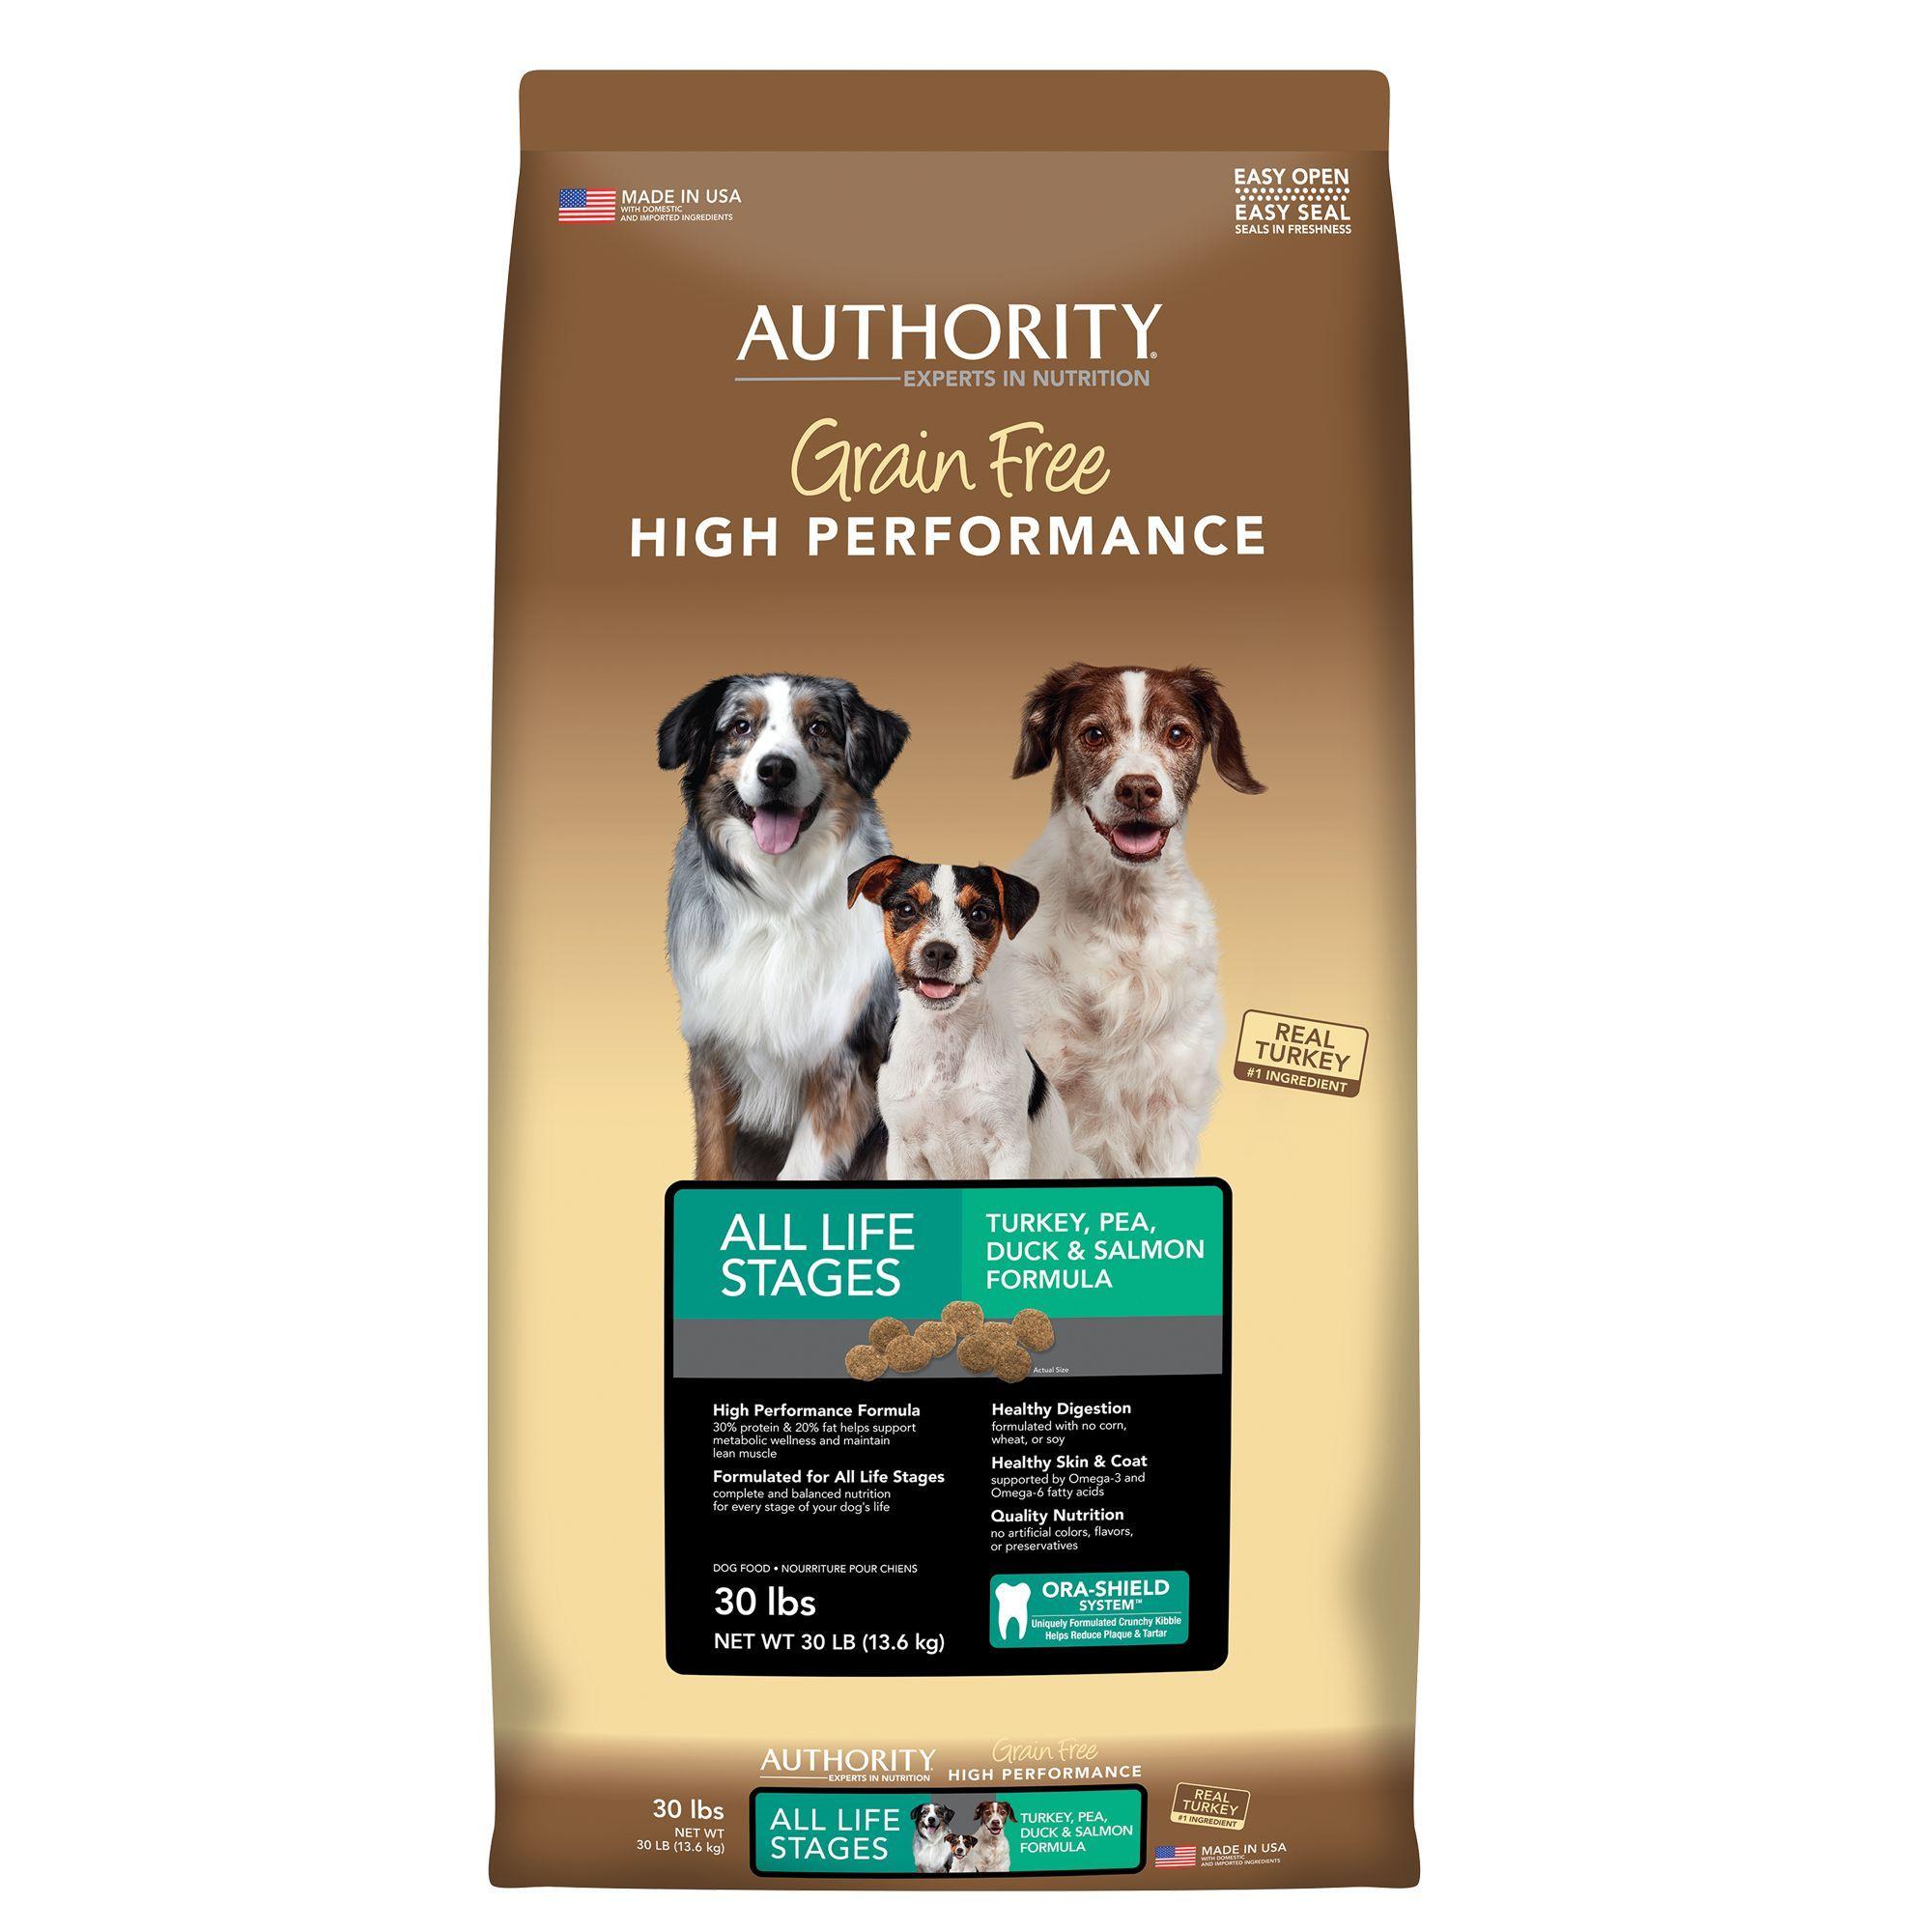 Authority Grain Free High Performance Dog Food Turkey Pea Duck